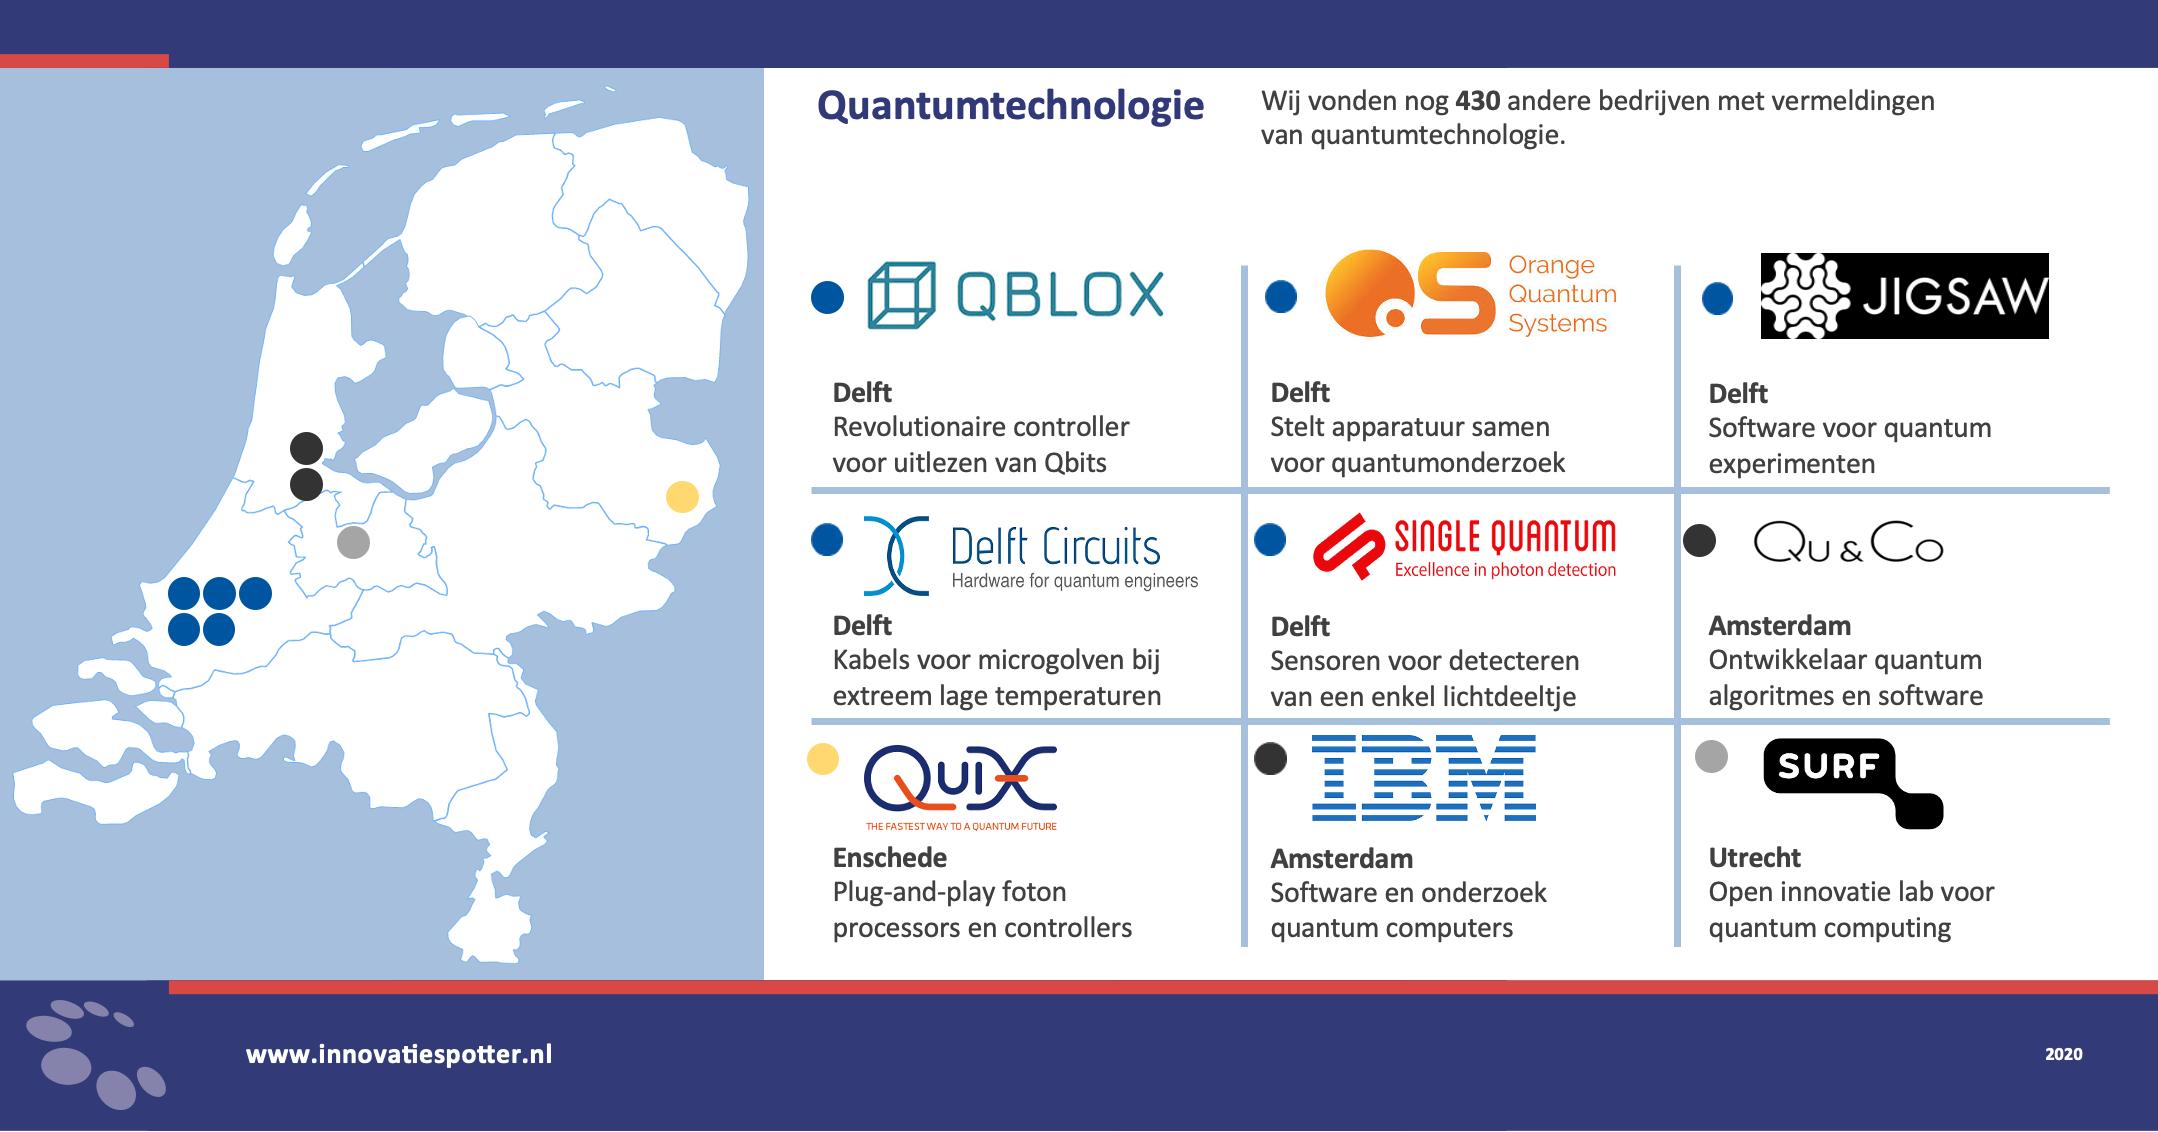 Quantumtechnologie in Nederland